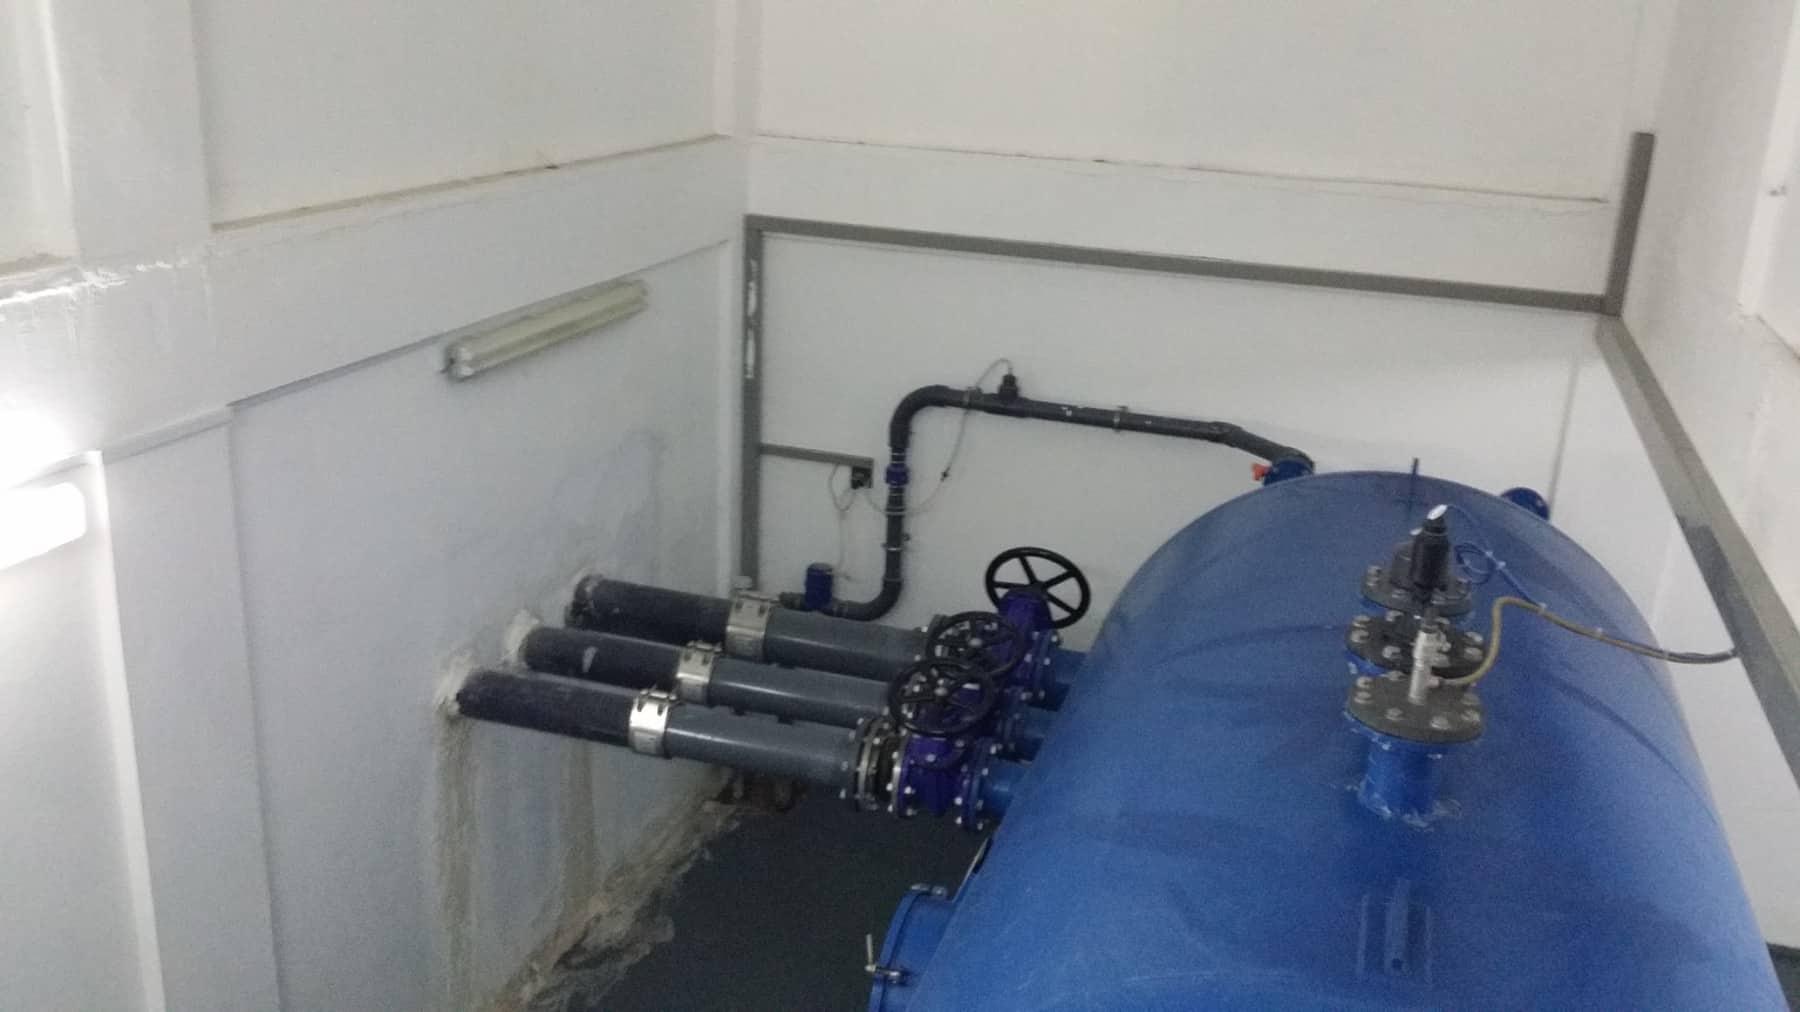 https://replan.com.sg/wp-content/uploads/2020/08/Hot-Water-pressure-tank-for-Renewal-Energy.jpeg